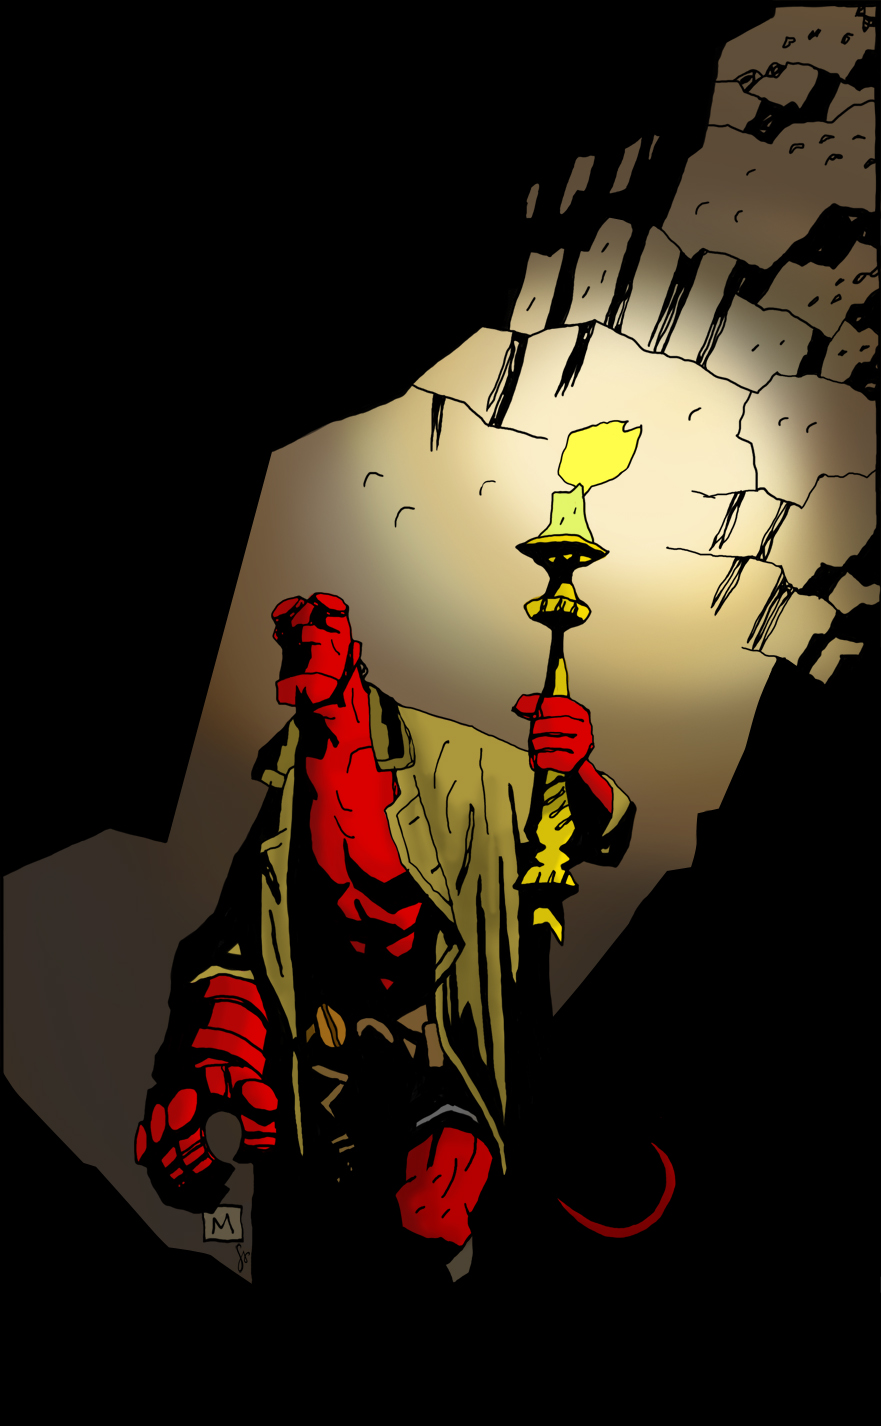 Mike Mignola Hellboy Wallpaper 37498 Usbdata